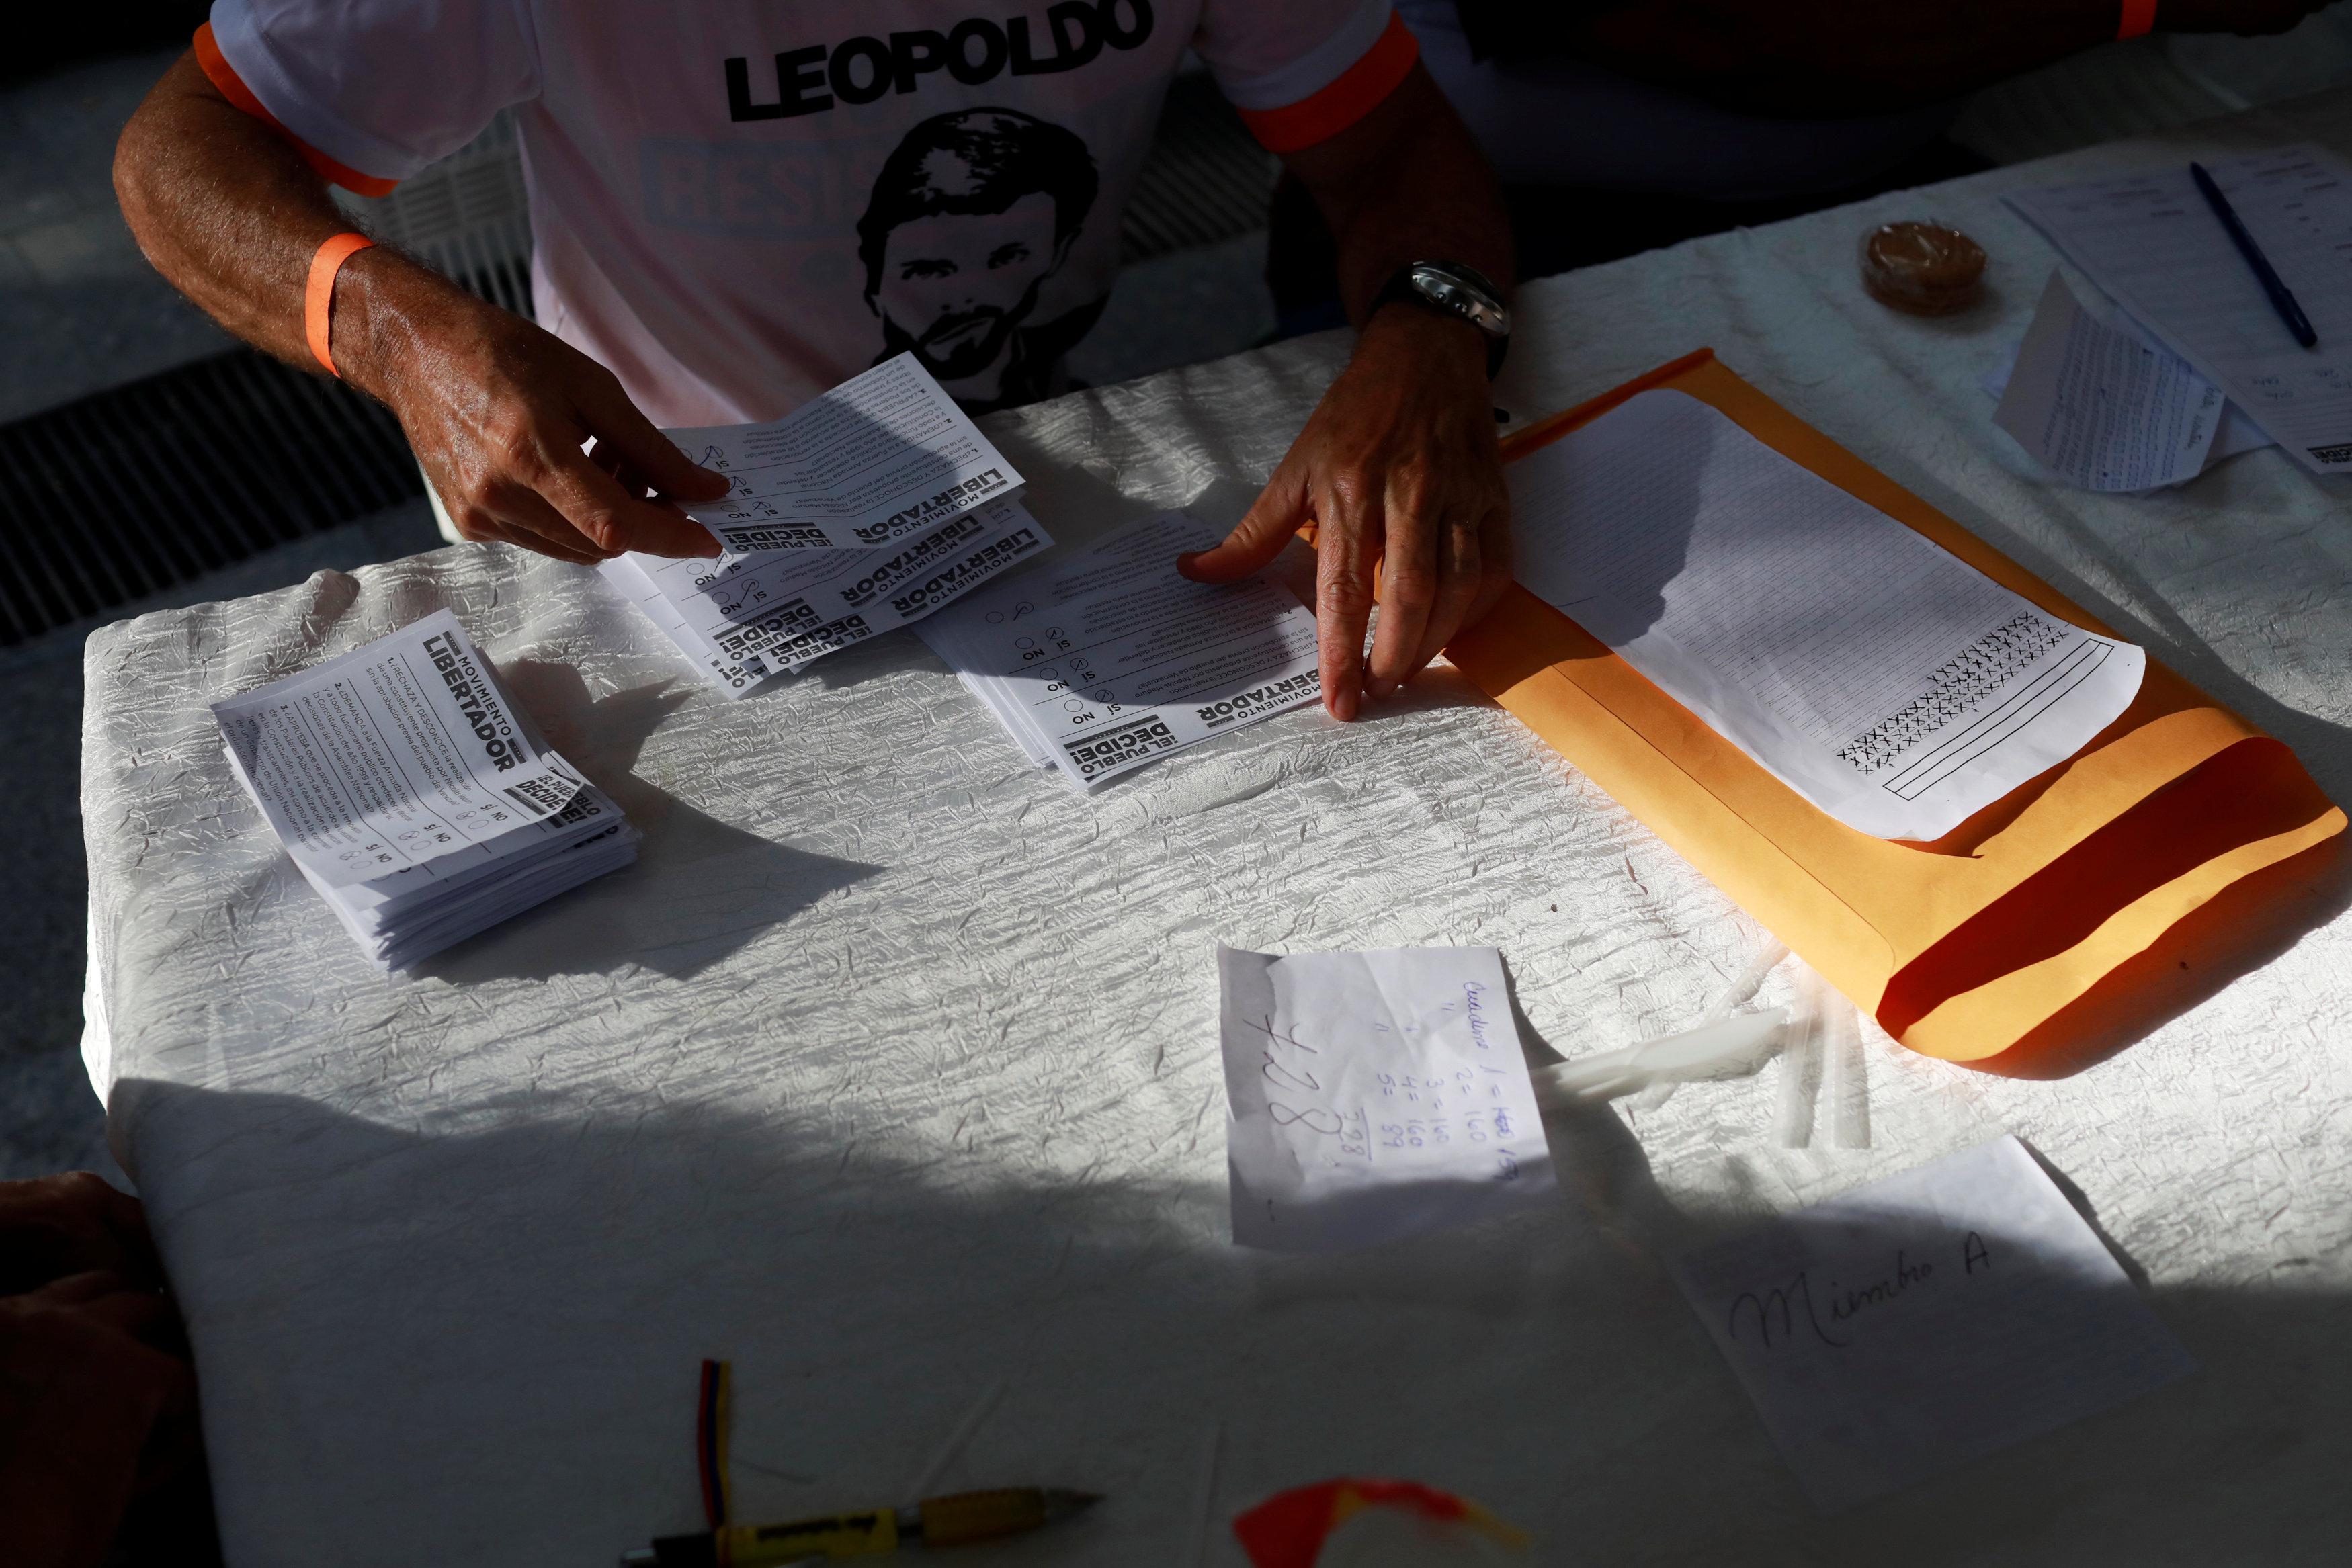 2017 07 16T214034Z 1263834569 RC1C54BD4700 RTRMADP 3 VENEZUELA POLITICS